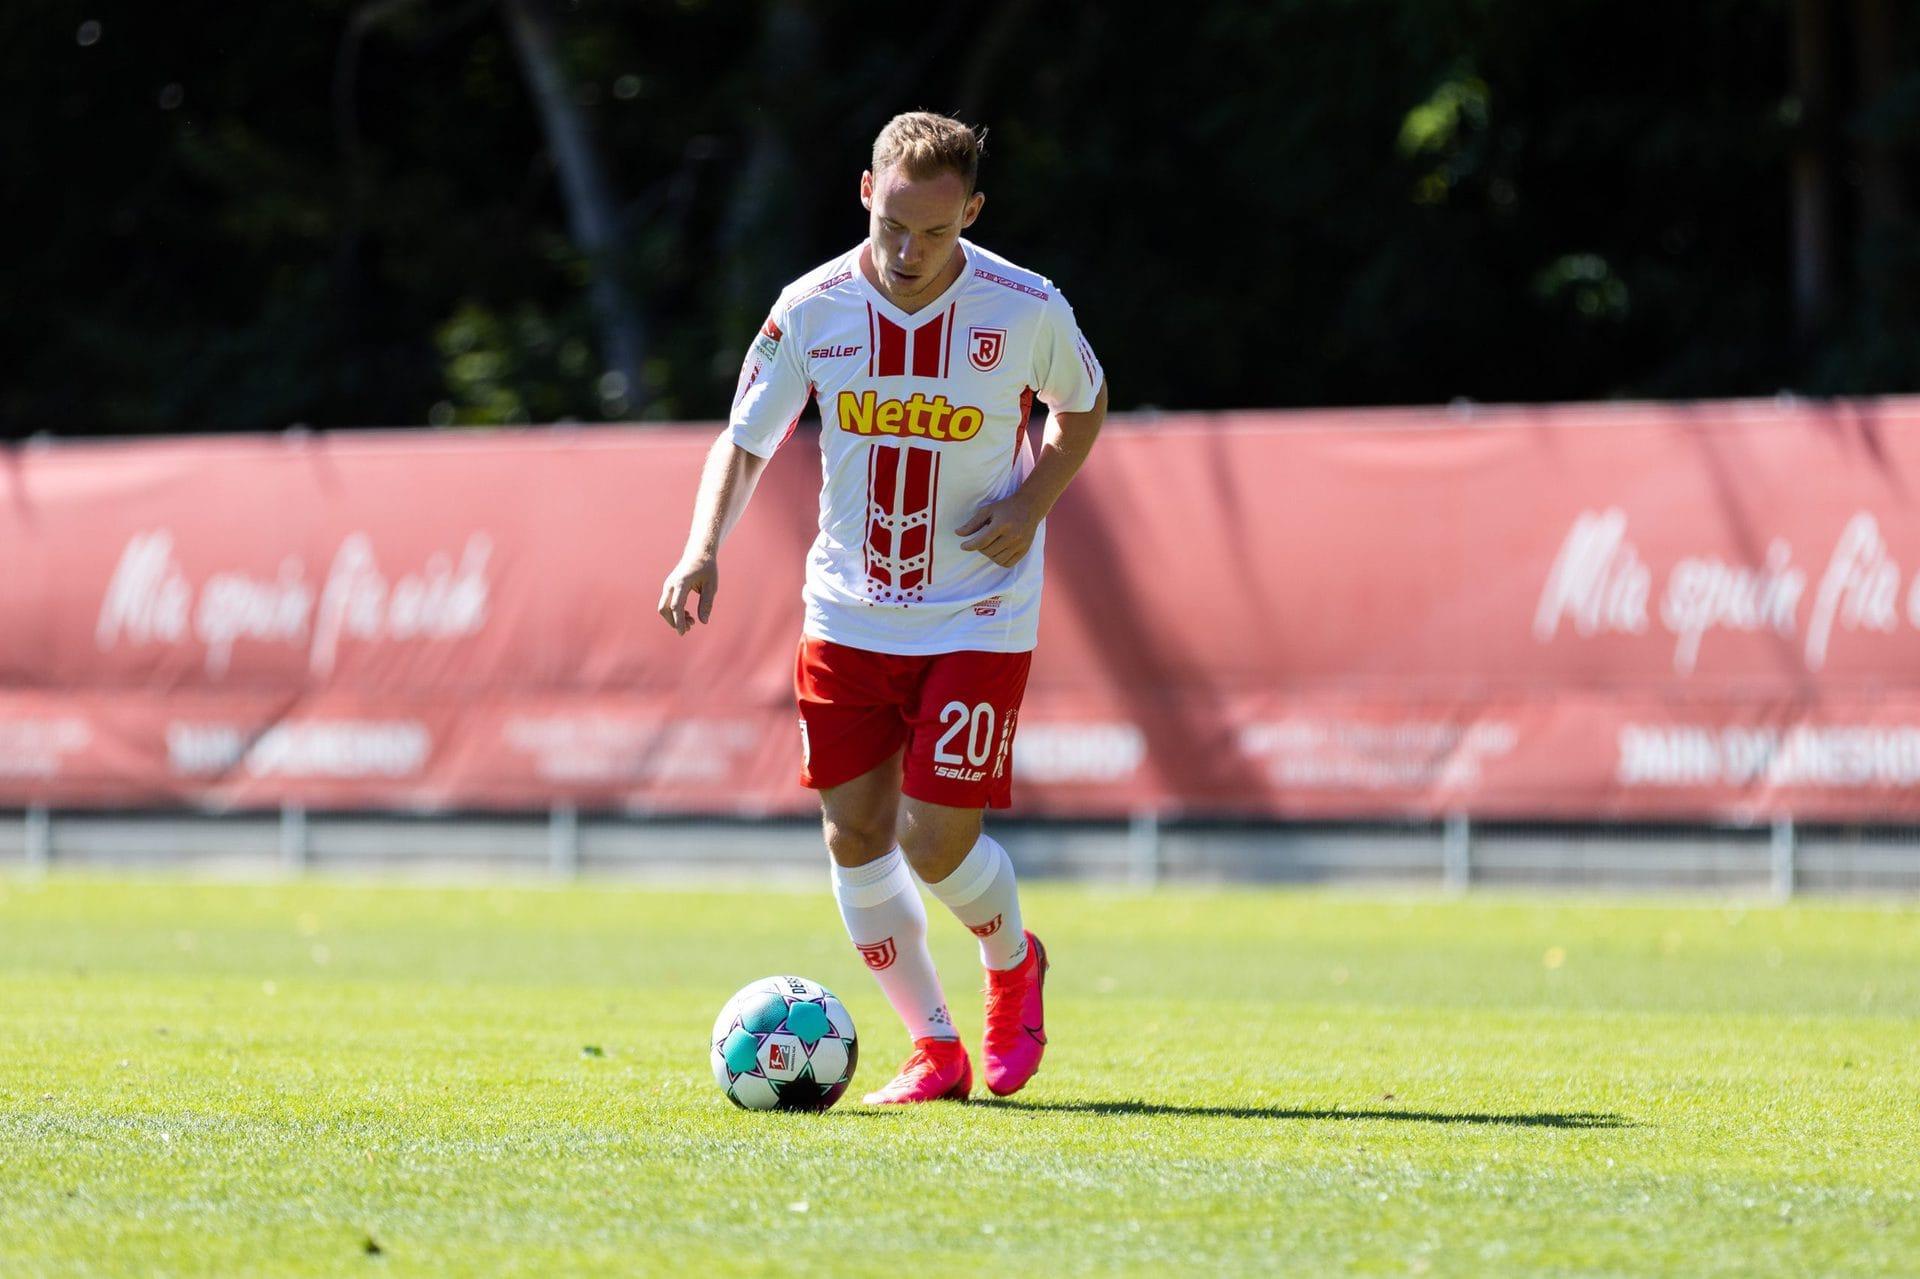 SSV Jahn: Federico Palacios schließt sich per Leihe dem MSV Duisburg an Bis Saisonende 2020/21